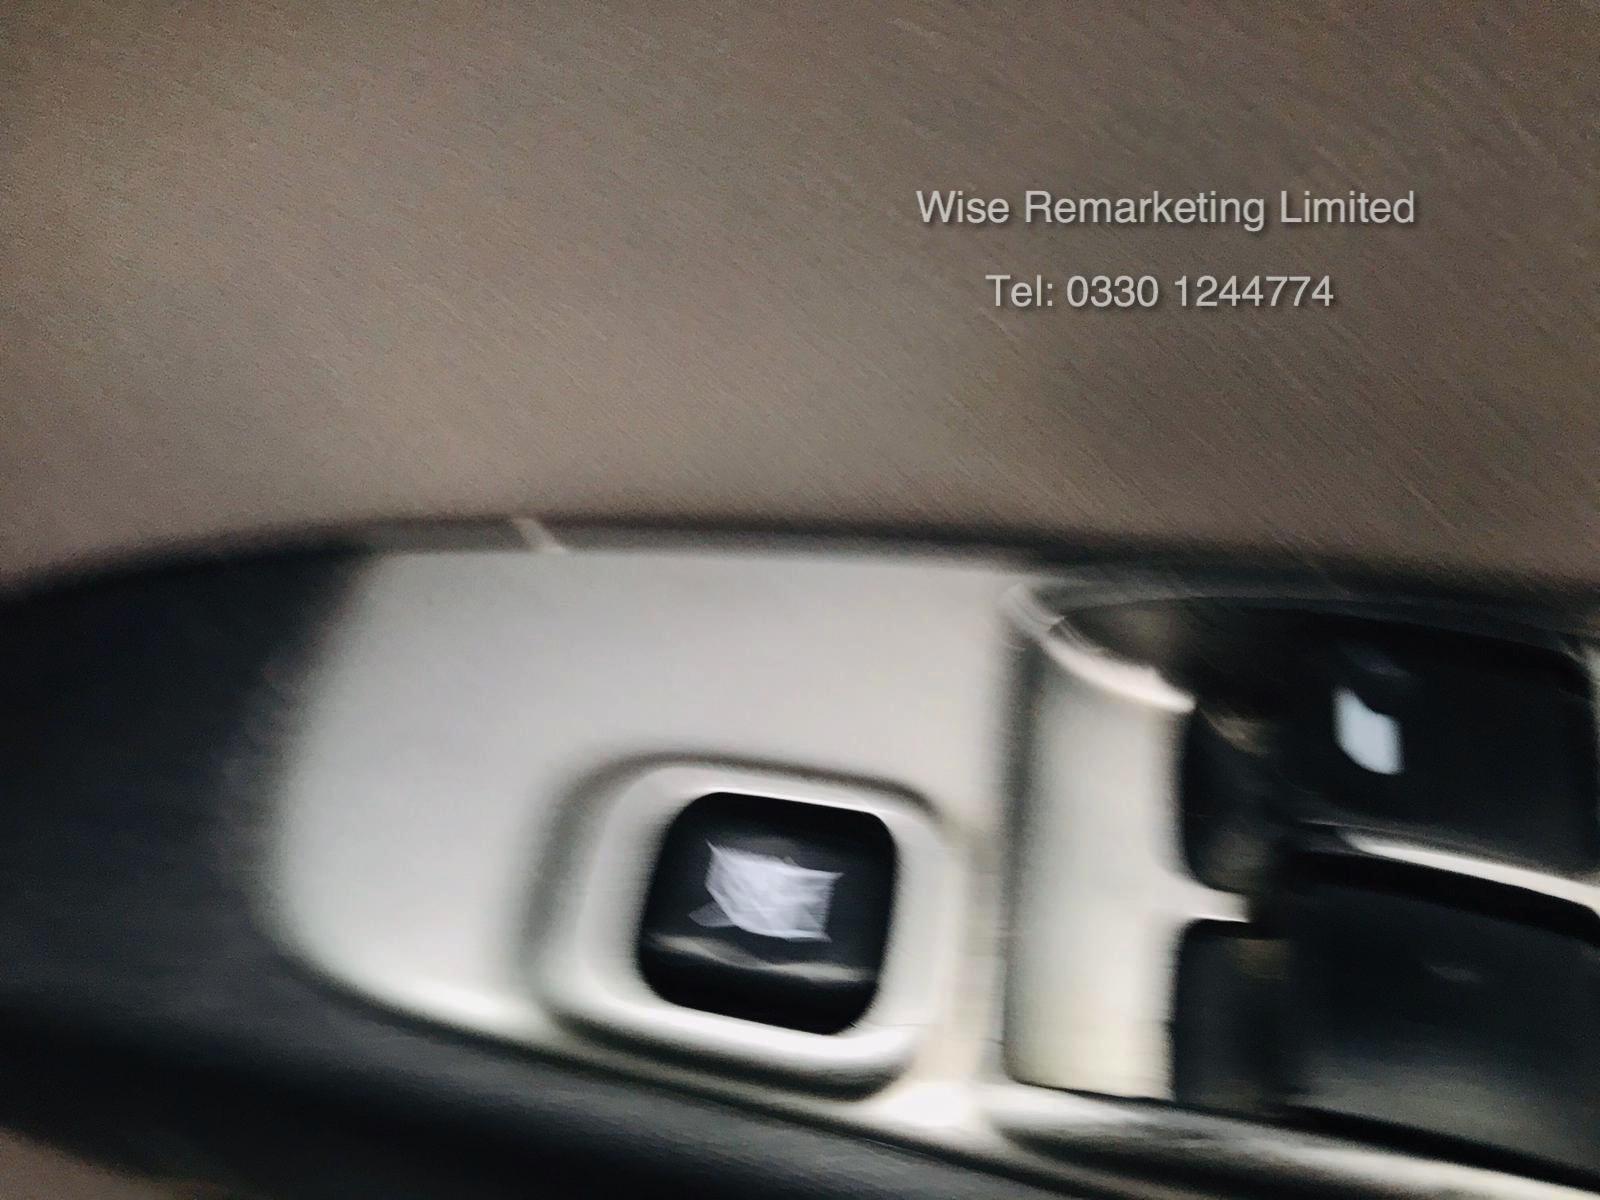 Mitsubishi L200 2.5 DI-D Warrior Auto - 2008 08 Reg - Full Leather - SAVE 20% NO VAT - Image 21 of 26